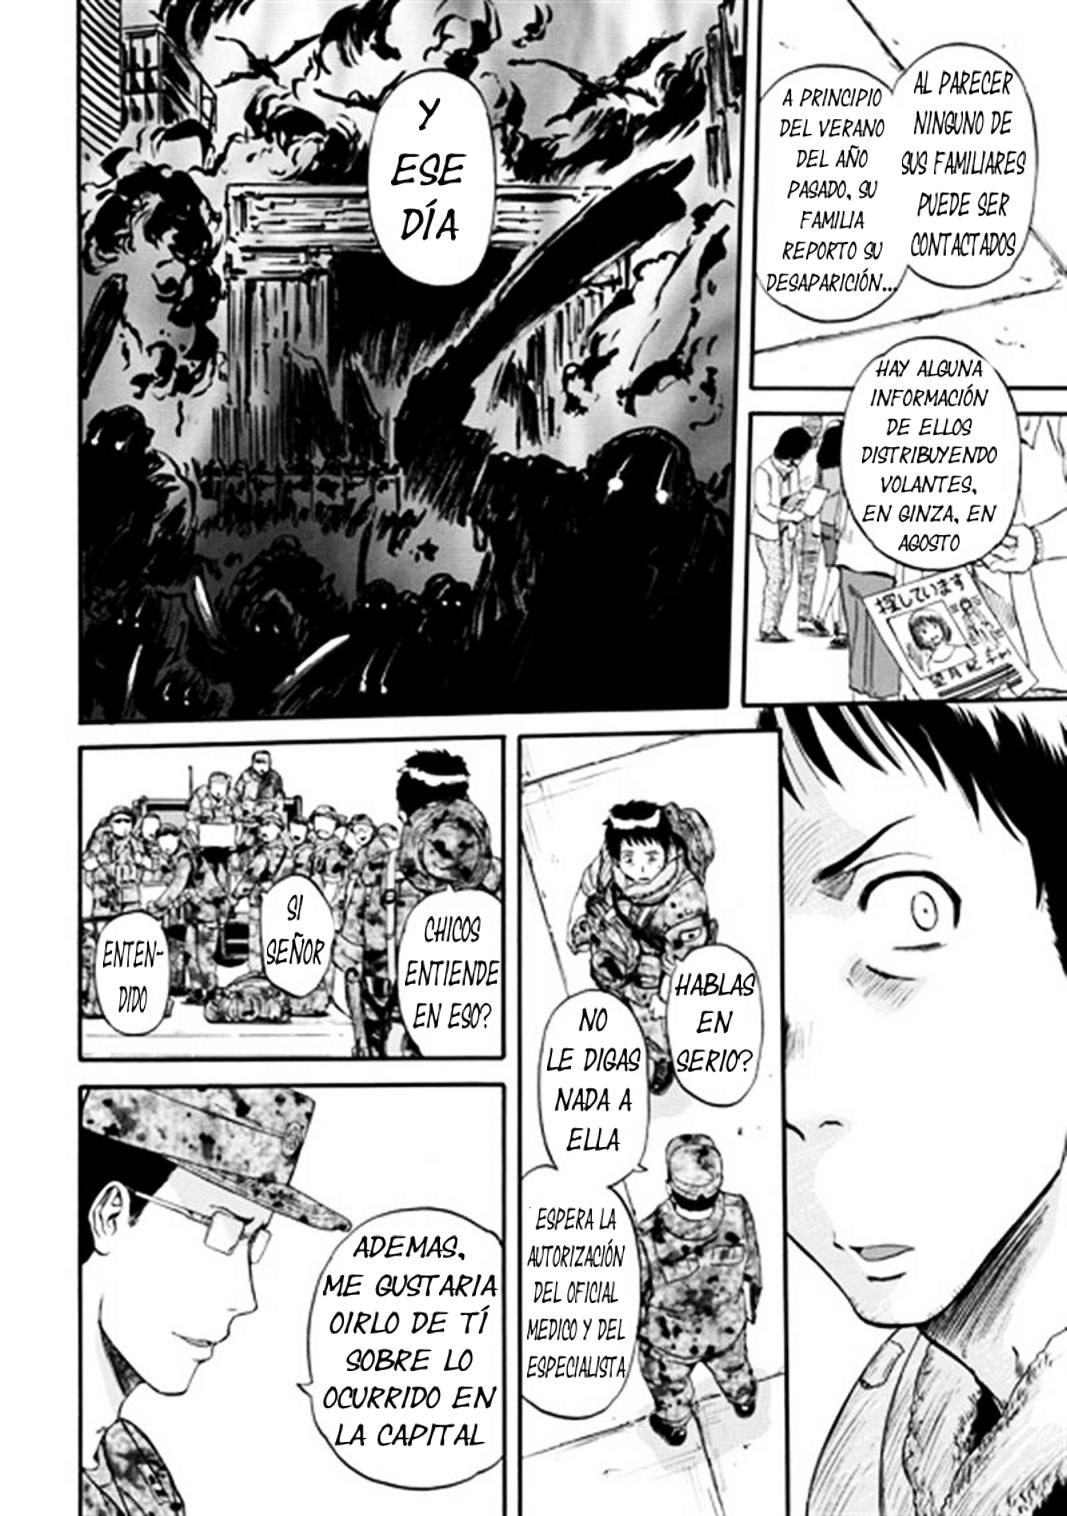 https://c5.mangatag.com/es_manga/59/187/351176/43d10fd5cd43cc221a69fe3064624258.jpg Page 9